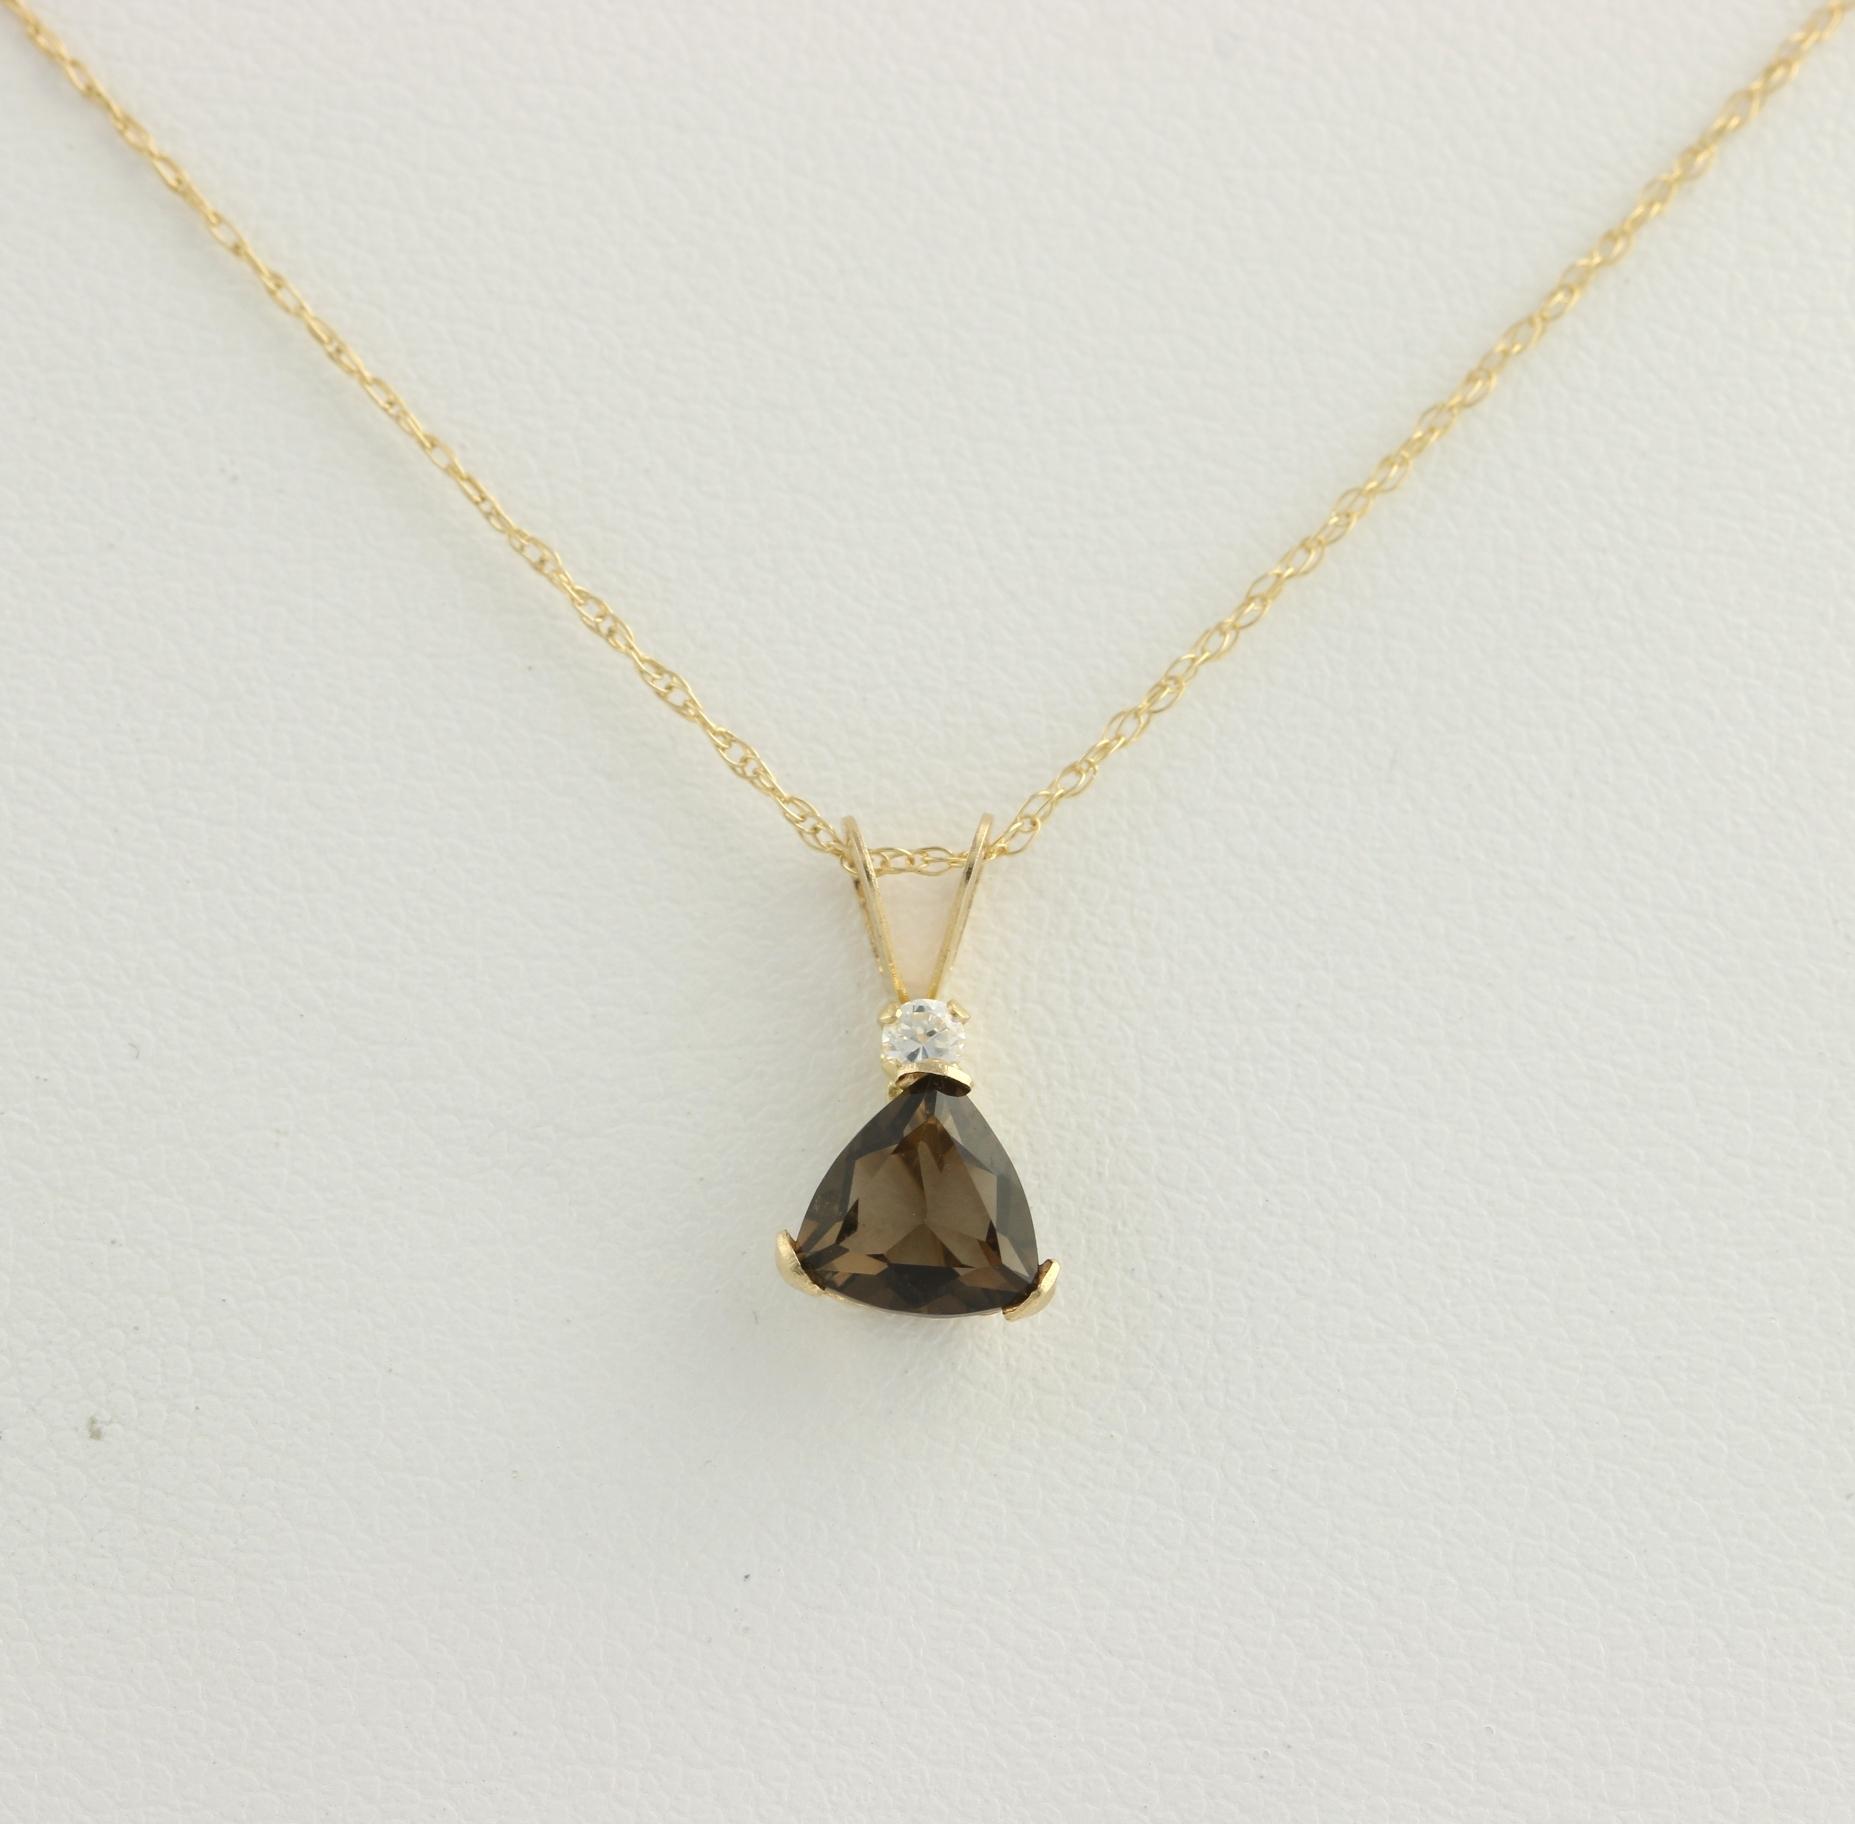 New smoky quartz pendant necklace 10k yellow gold cz accent 18 click thumbnails to enlarge aloadofball Images